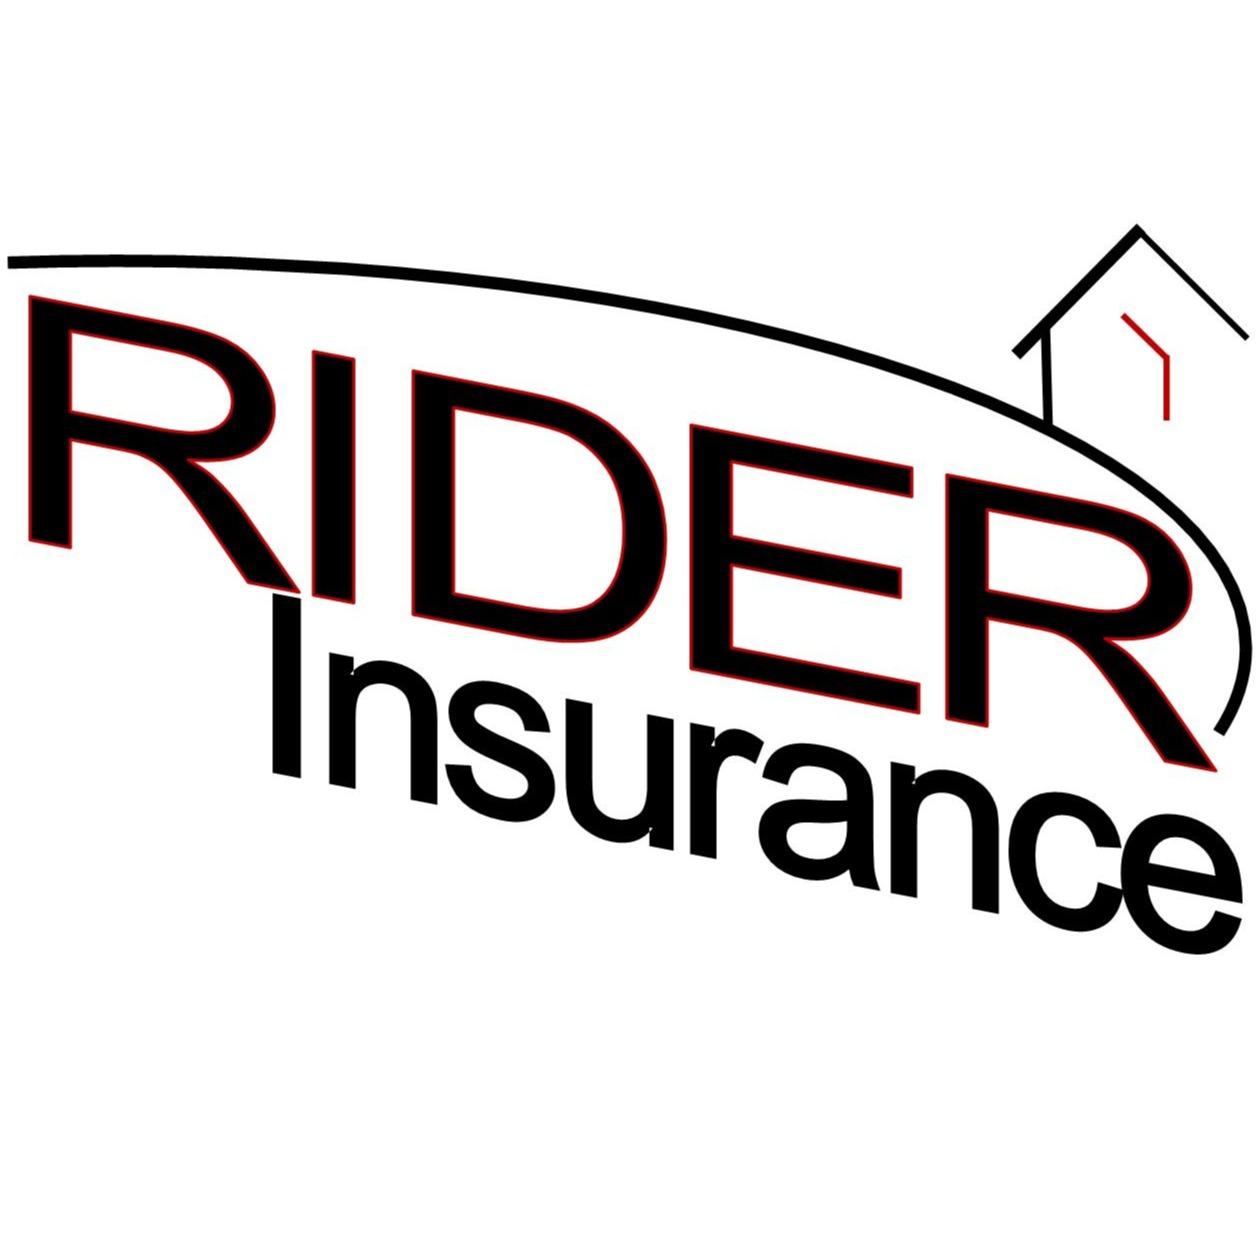 Rider Insurance Company Towson 21286 Nationwide